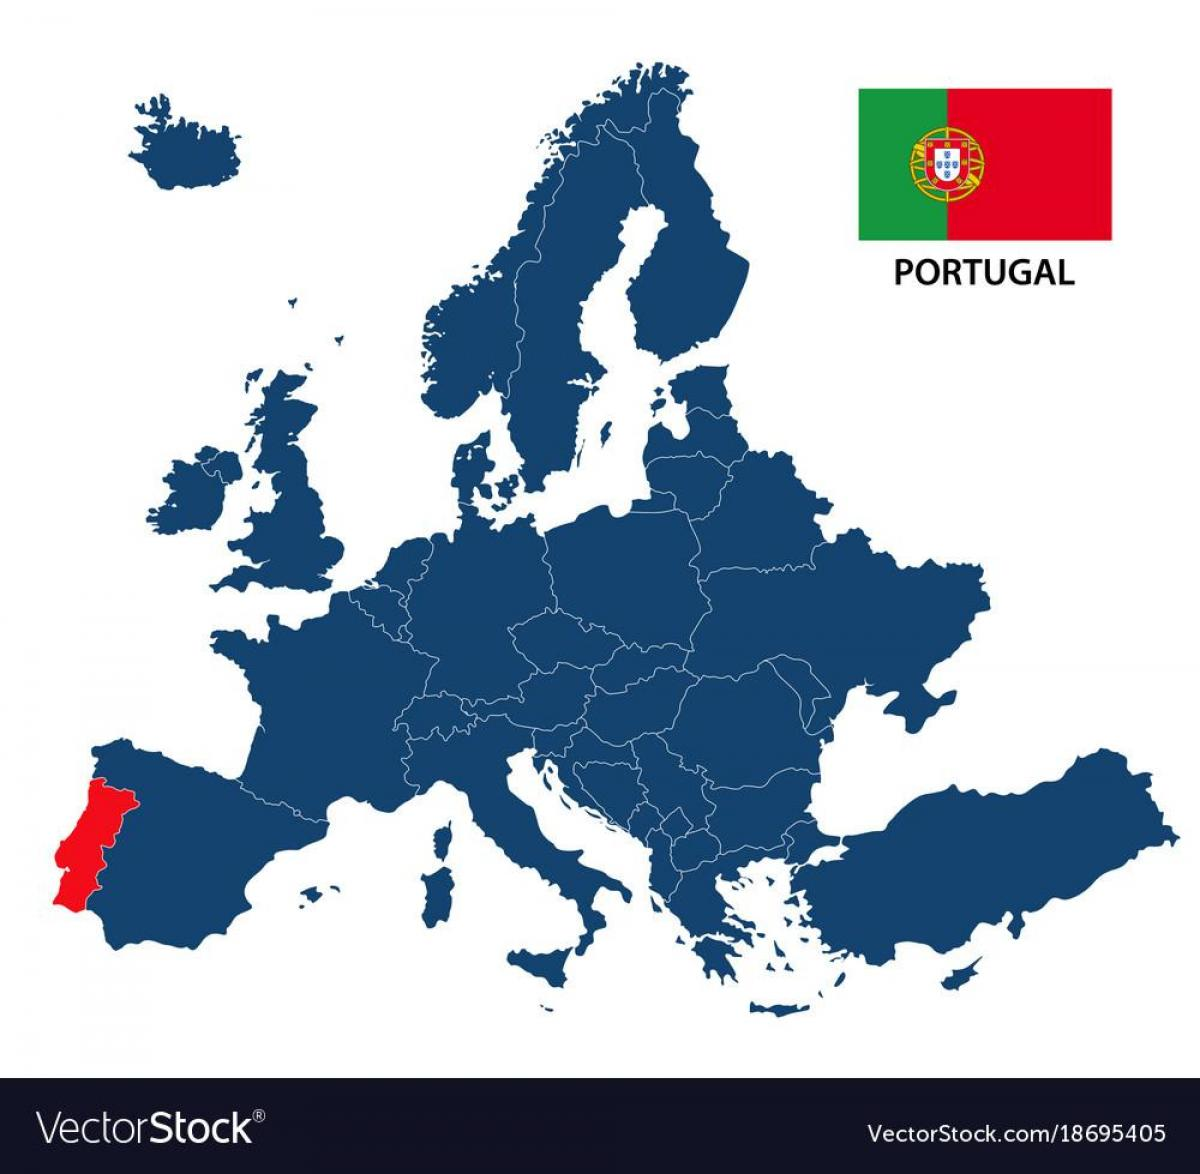 mapa de portugal na europa Europa mapa Portugal   Mapa ng Portugal sa Europa (Southern Europa  mapa de portugal na europa